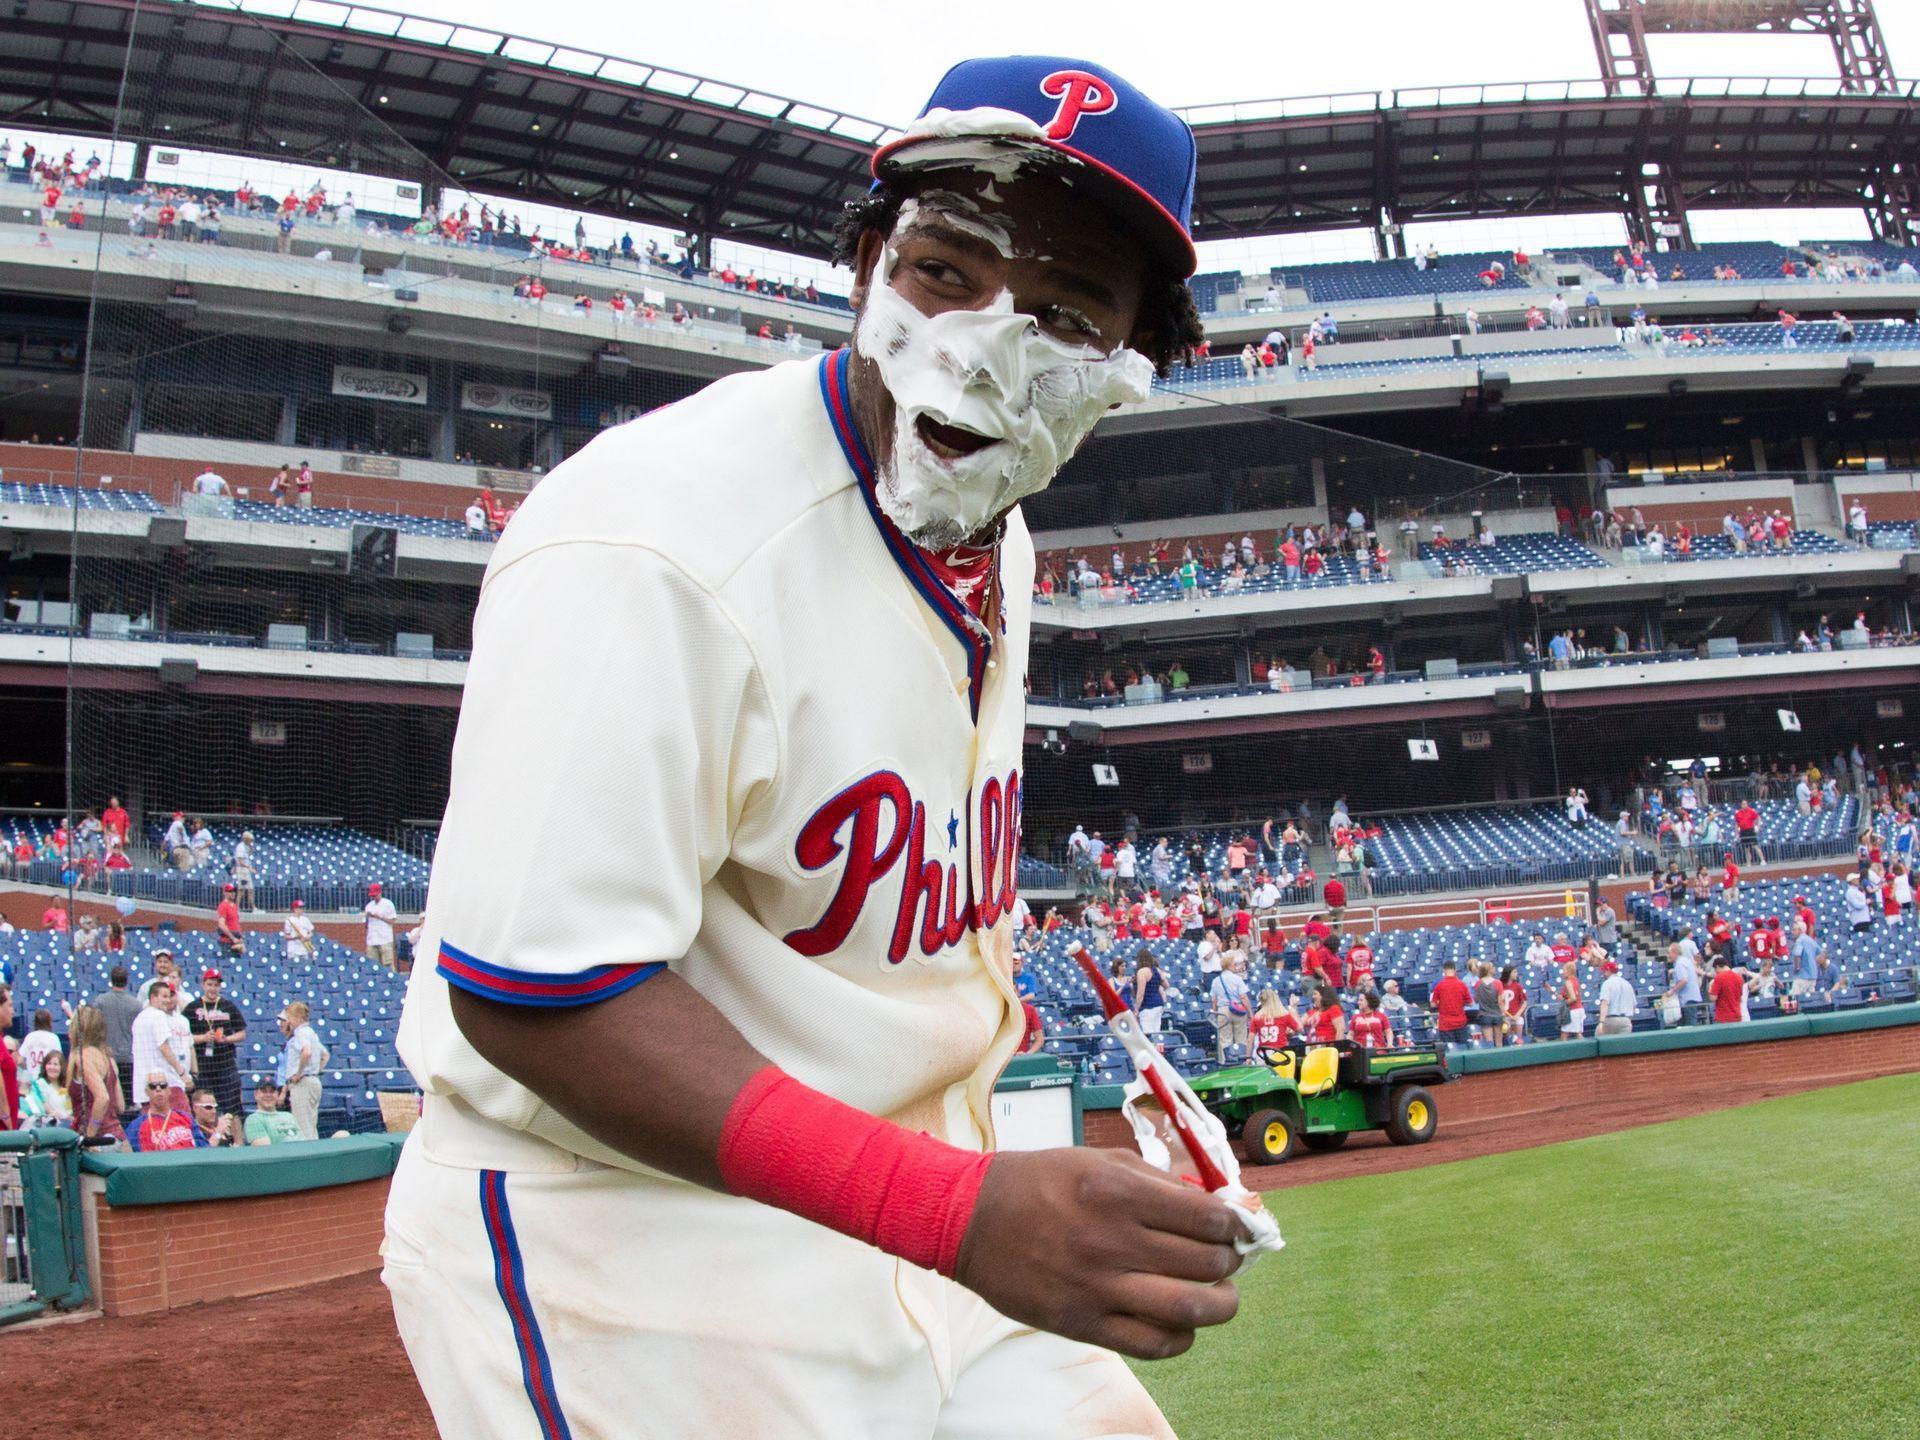 Philadelphia Phillies third baseman Maikel Franco gets a pie in the face celebrating their 6-0 win over the Arizona Diamondbacks in Philadelphia.   Bill Streicher, USA TODAY Sports